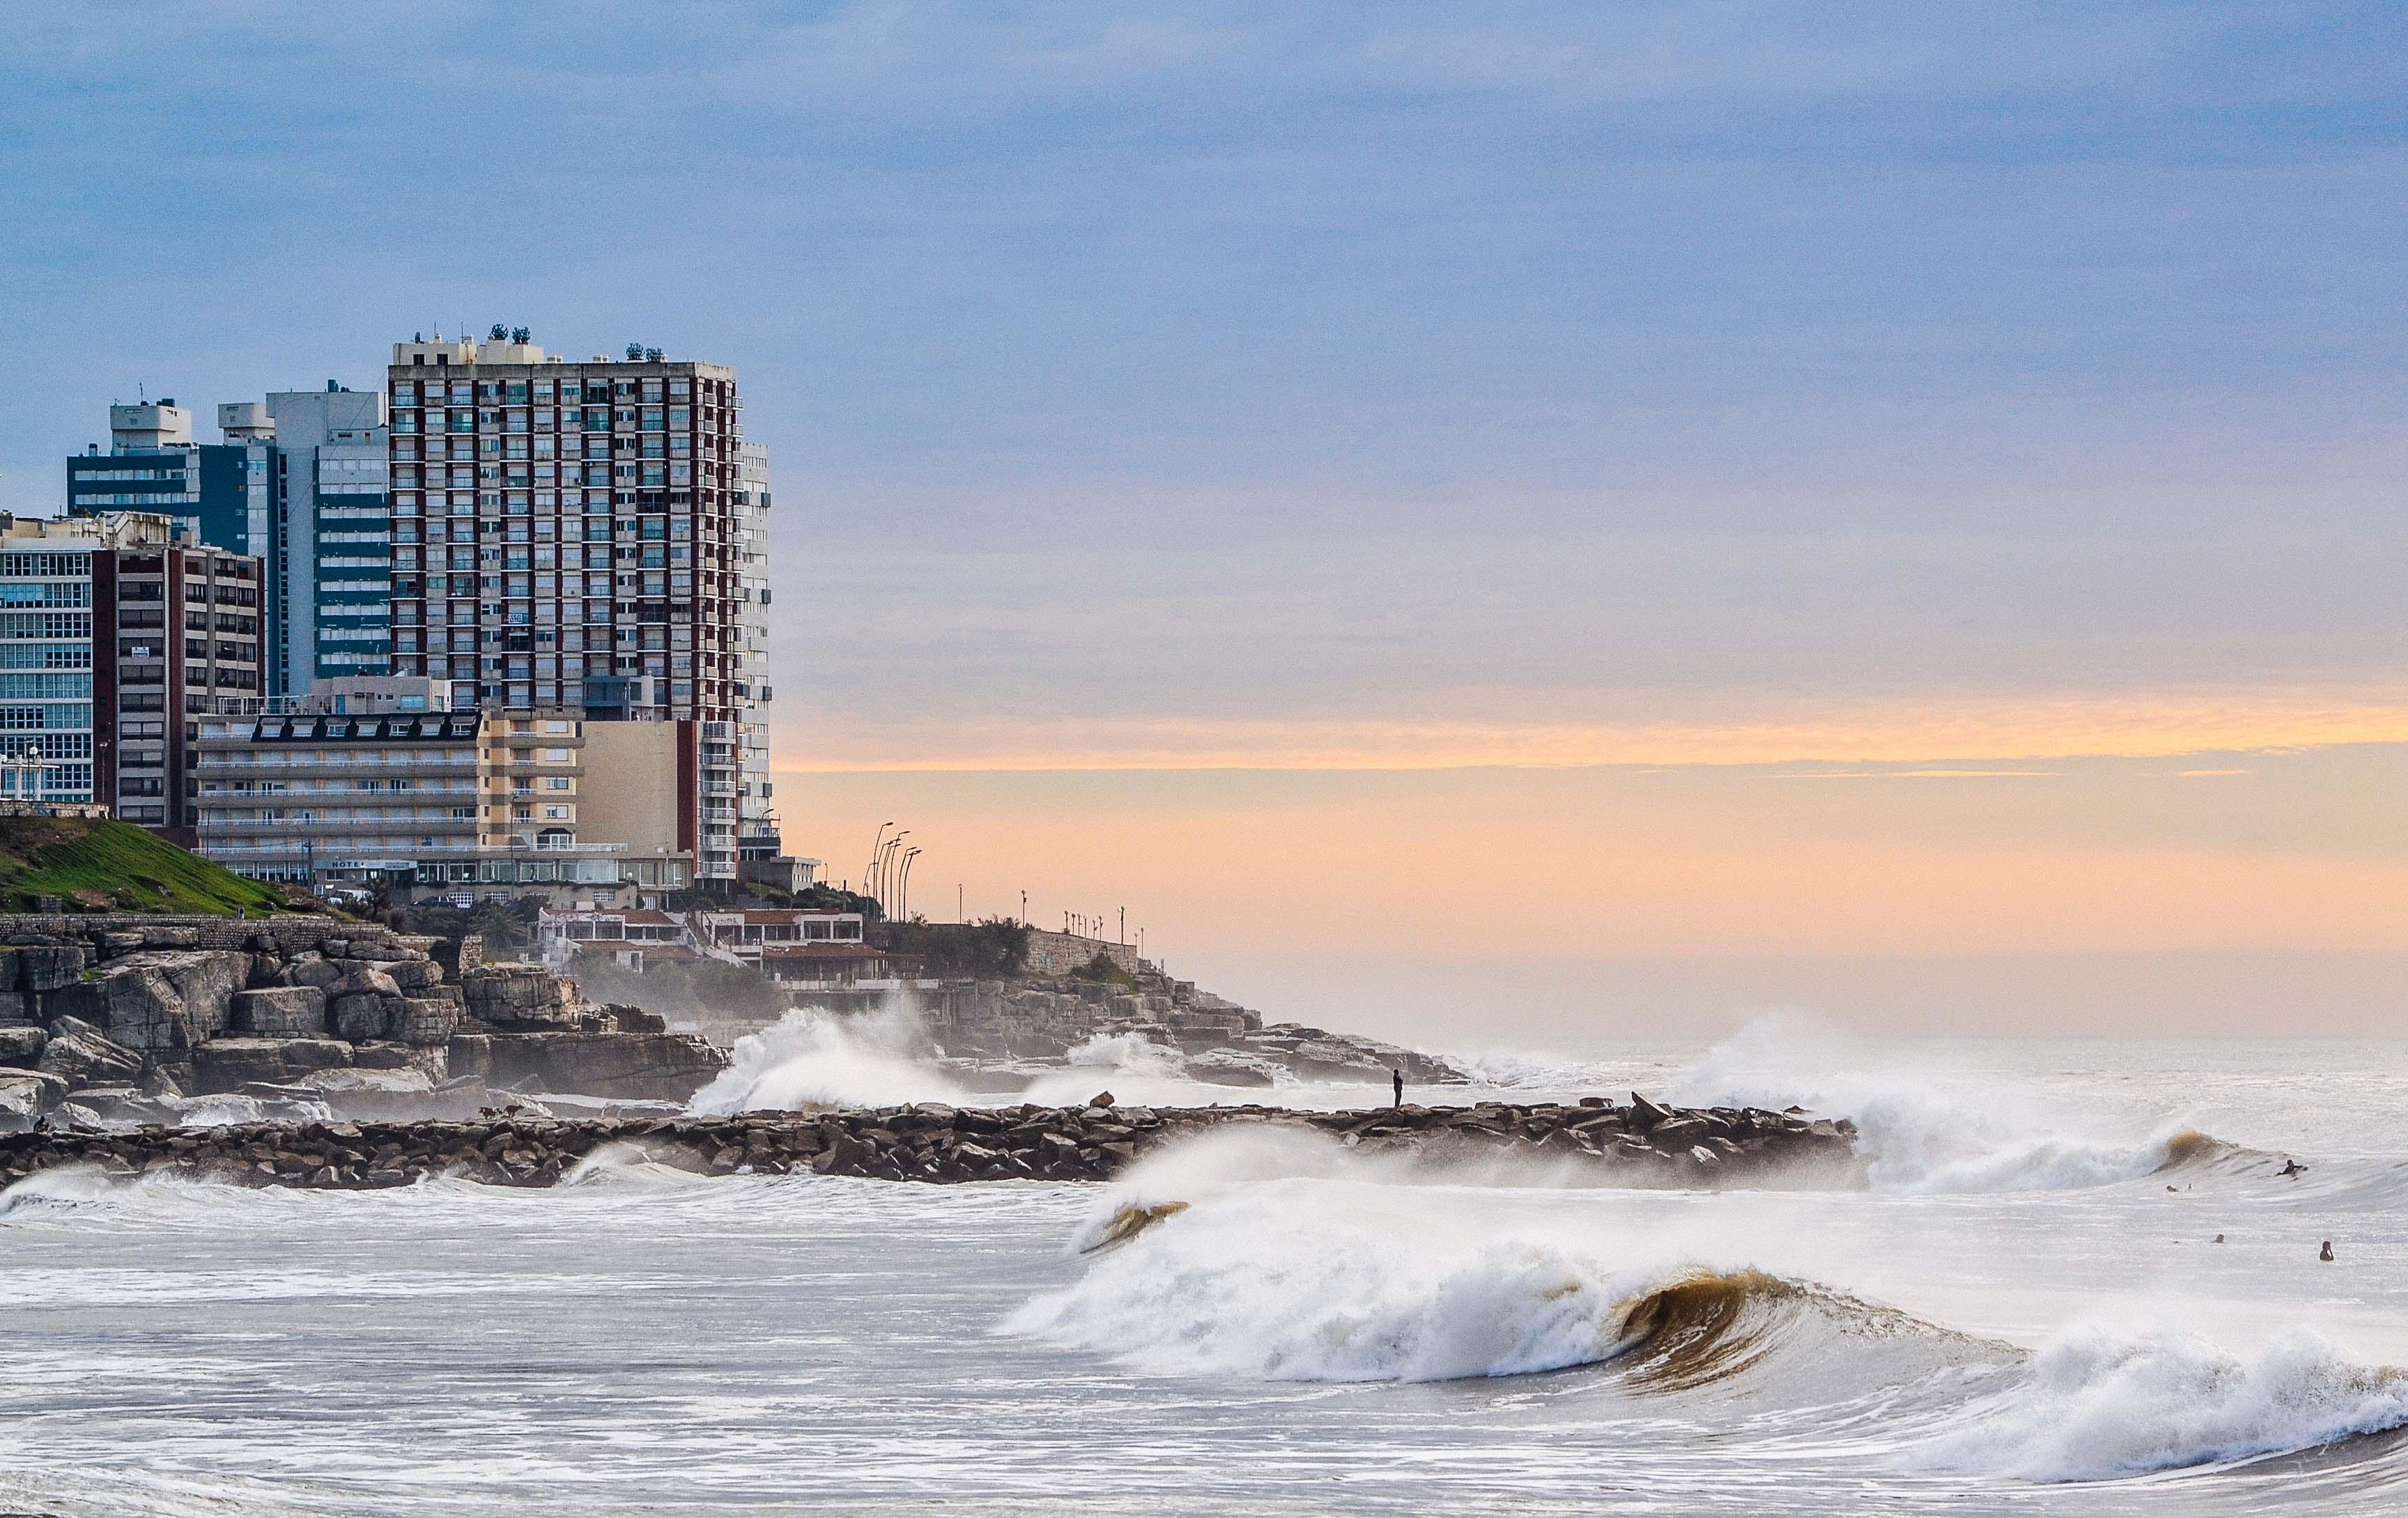 sea wave splashing in seashore